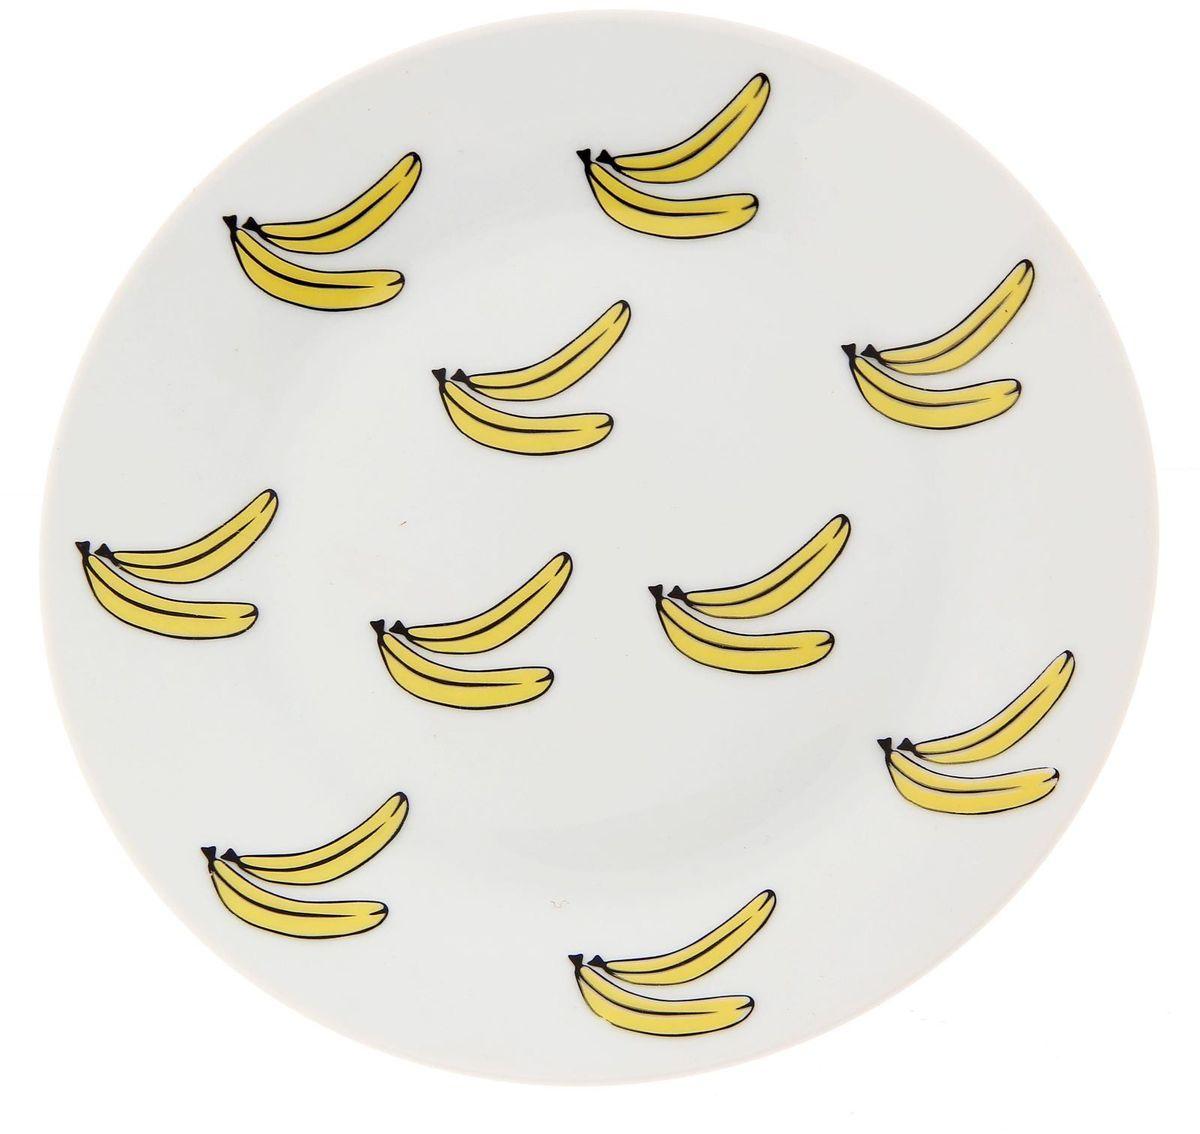 Тарелка мелкая Сотвори чудо Бананы, диаметр 20 см тарелка мелкая сотвори чудо полярный мишка диаметр 20 см